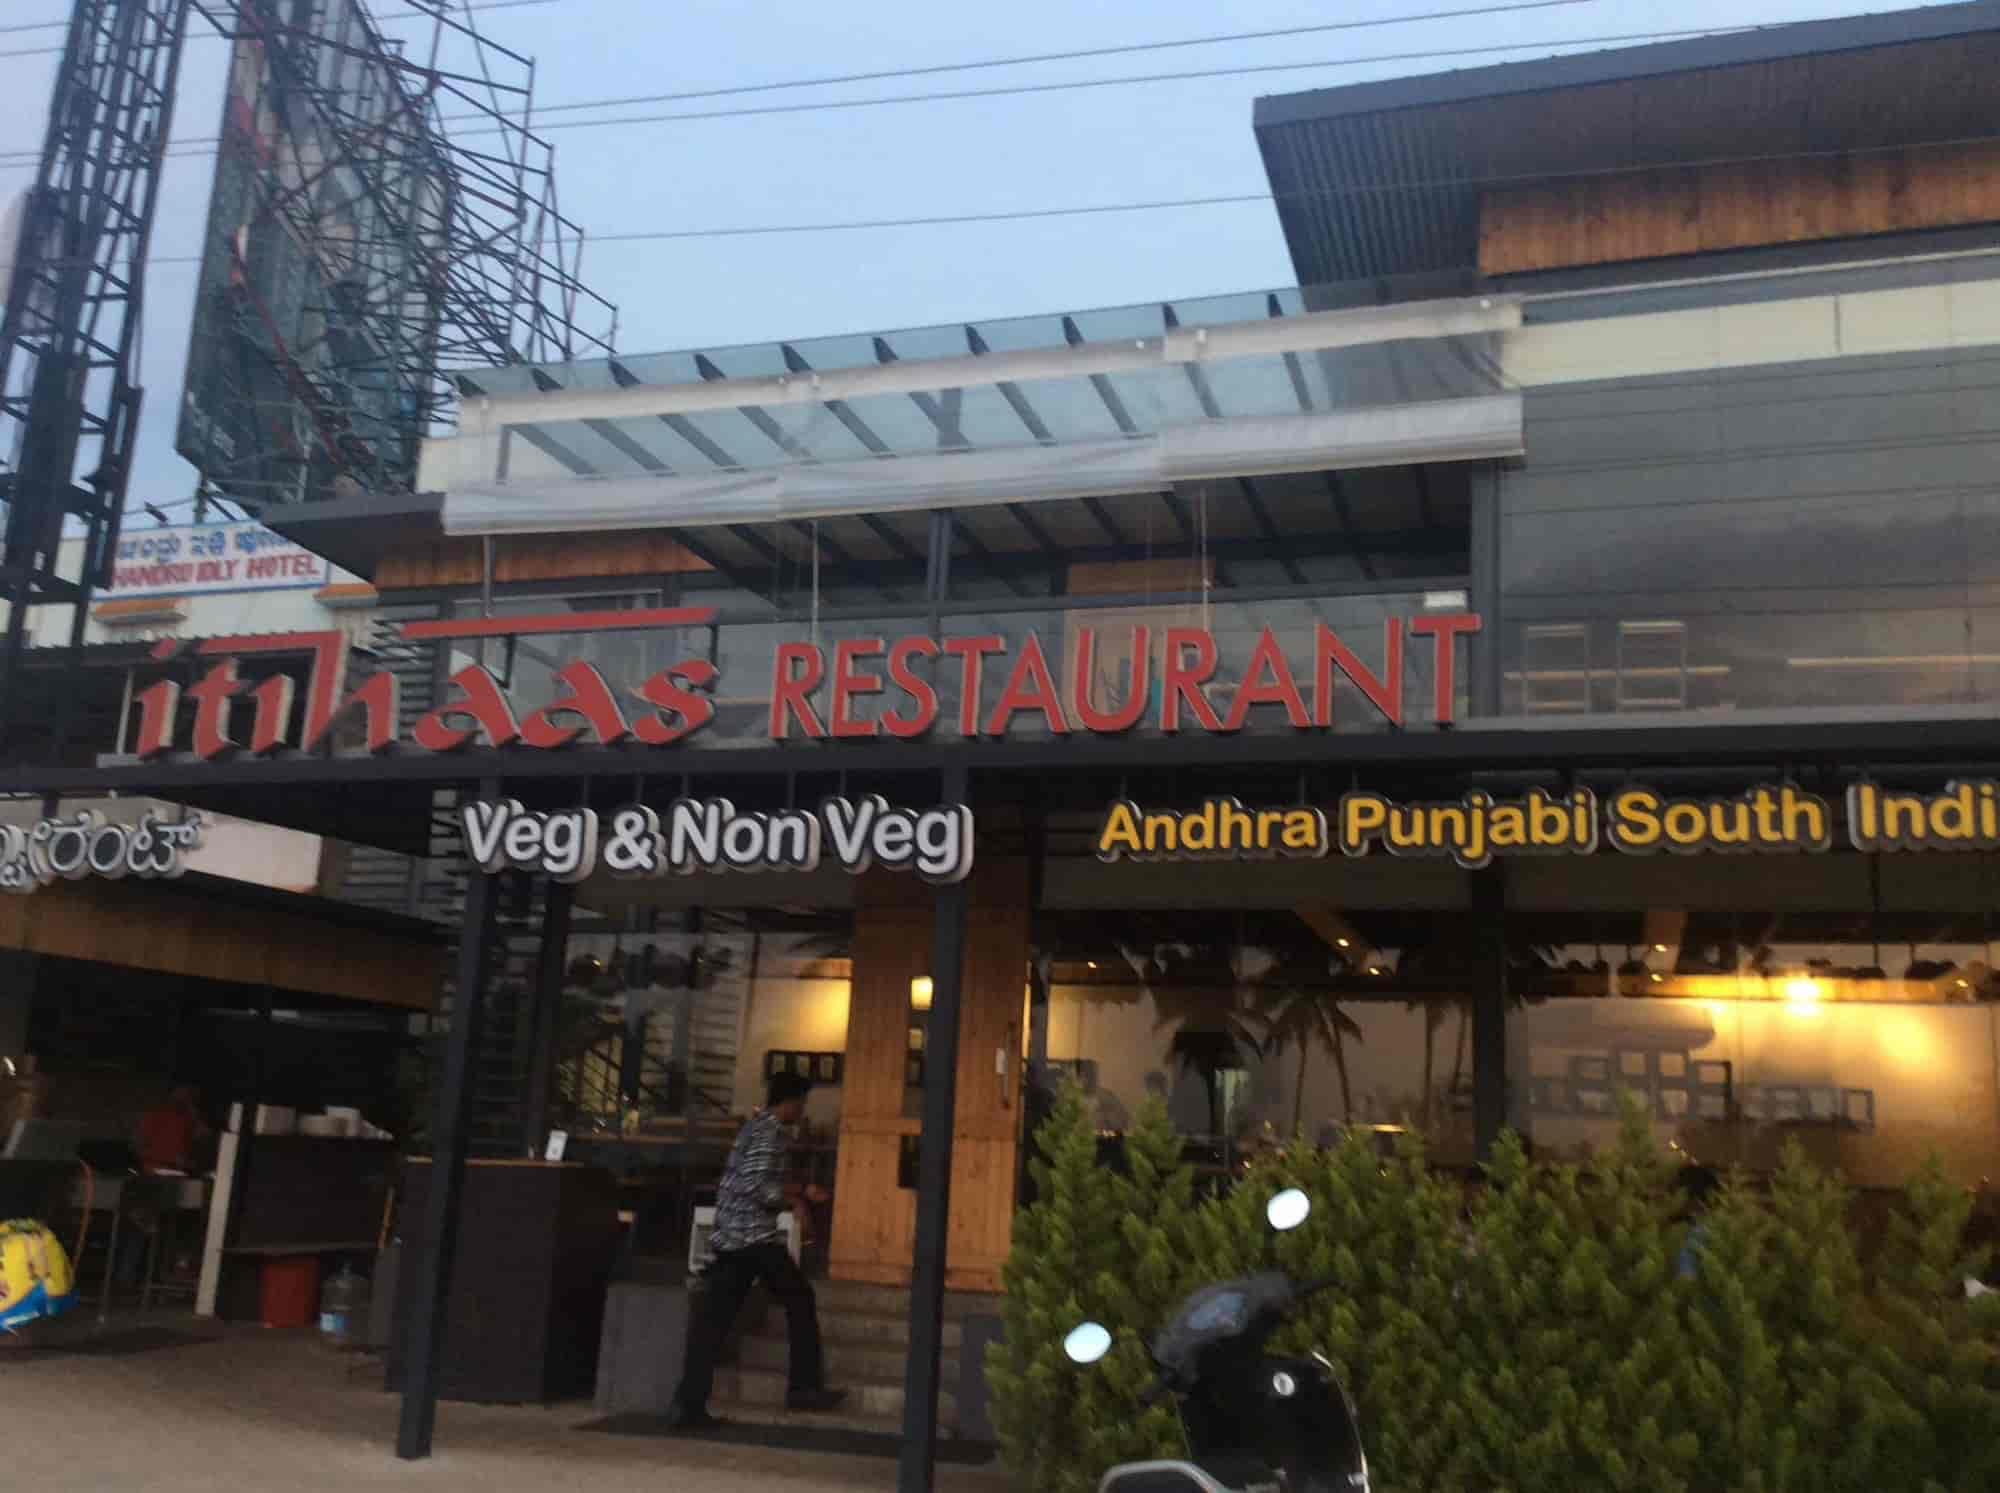 Itihaas Restaurant Chikkajala Bangalore Home Delivery Restaurants Justdial